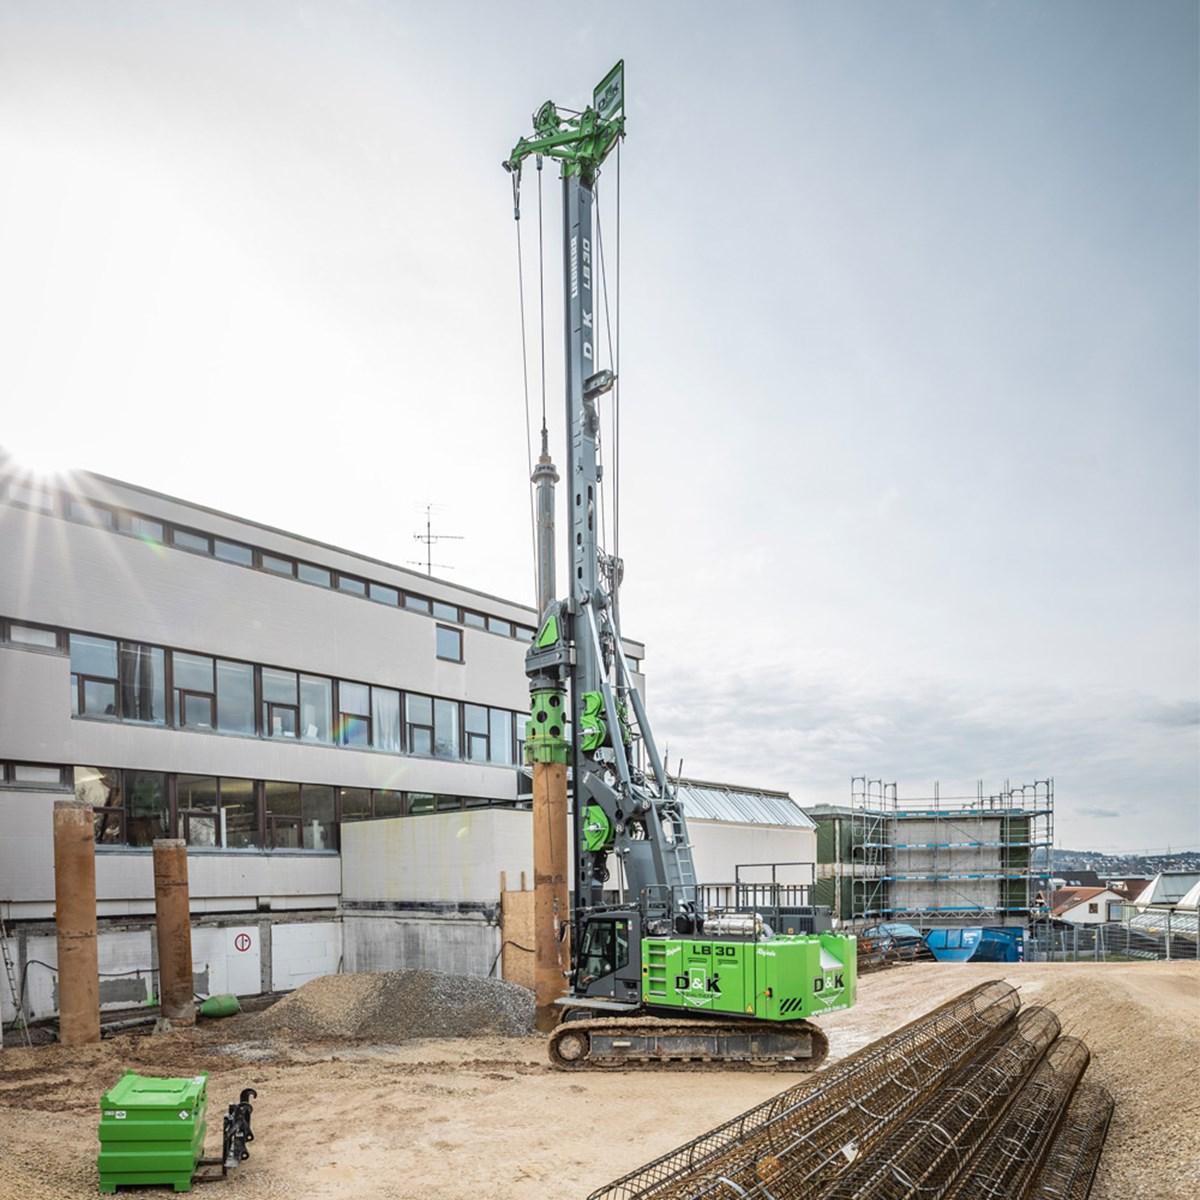 liebherr-lb-30-drilling-rig-drehbohrgerat-kellybohren-kelly-drilling-pic2-1.jpg